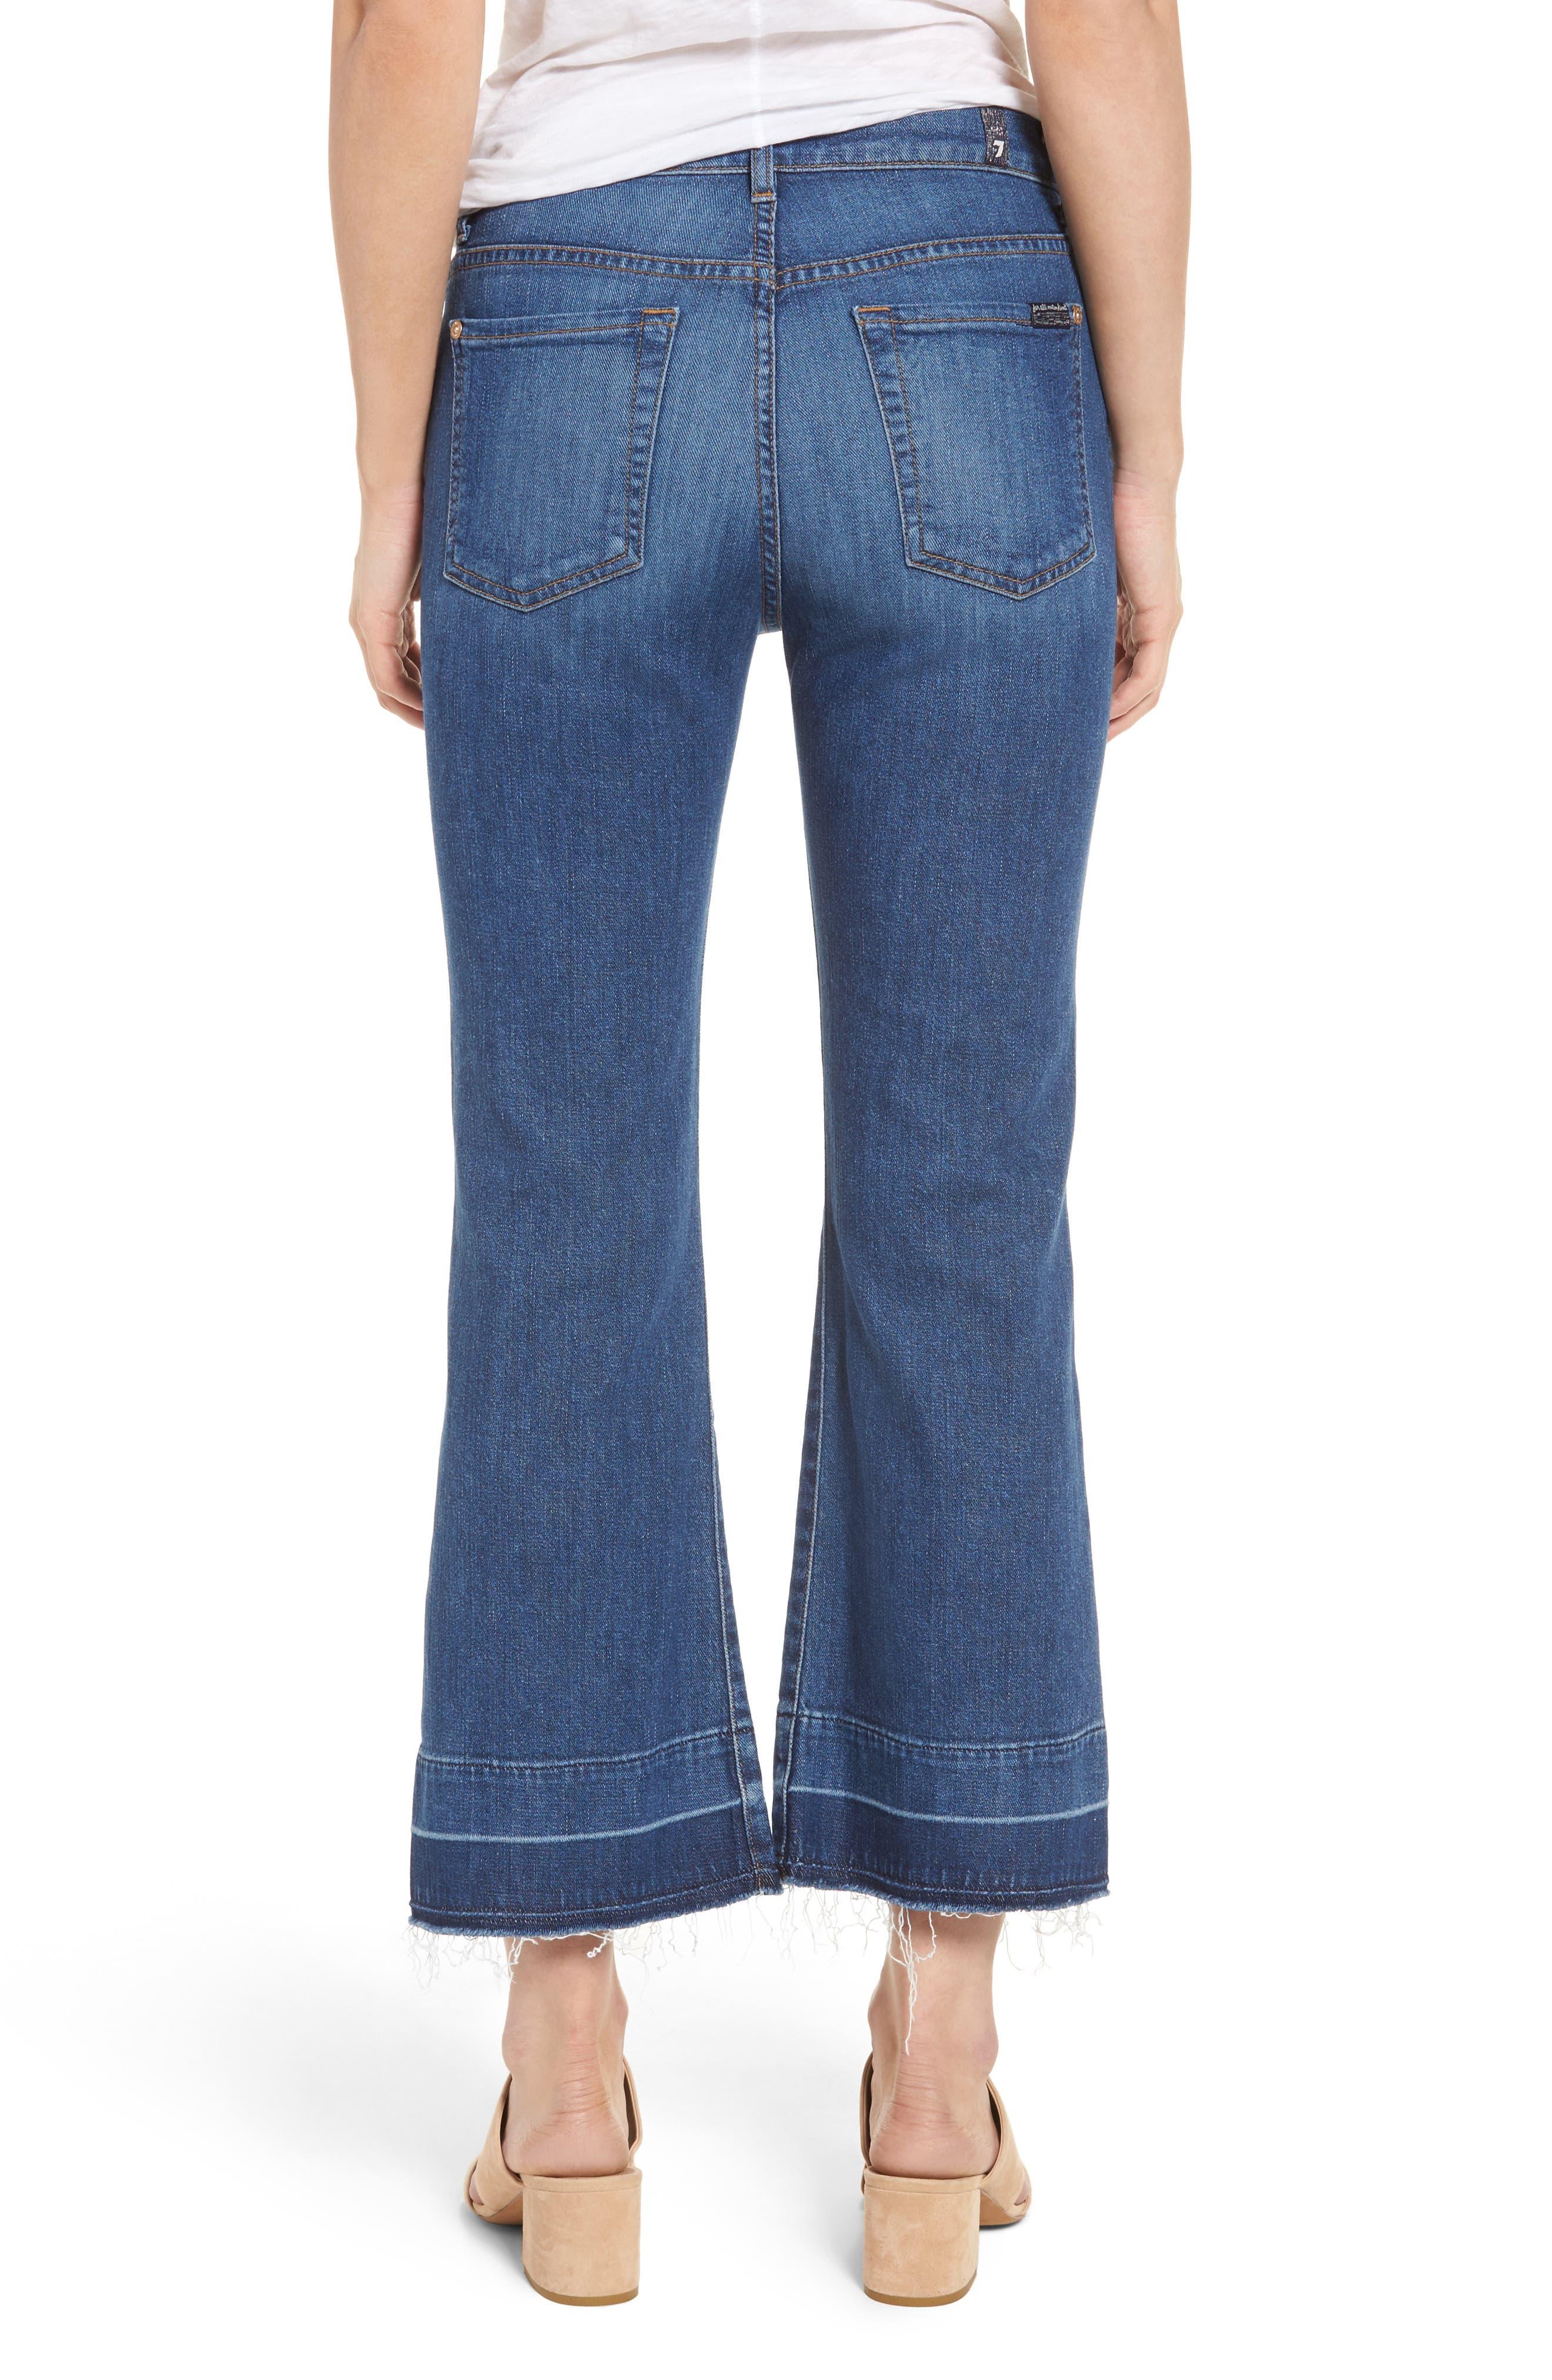 7 FOR ALL MANKIND<SUP>®</SUP>, Ali Split Hem Crop Flare Jeans, Alternate thumbnail 2, color, 401